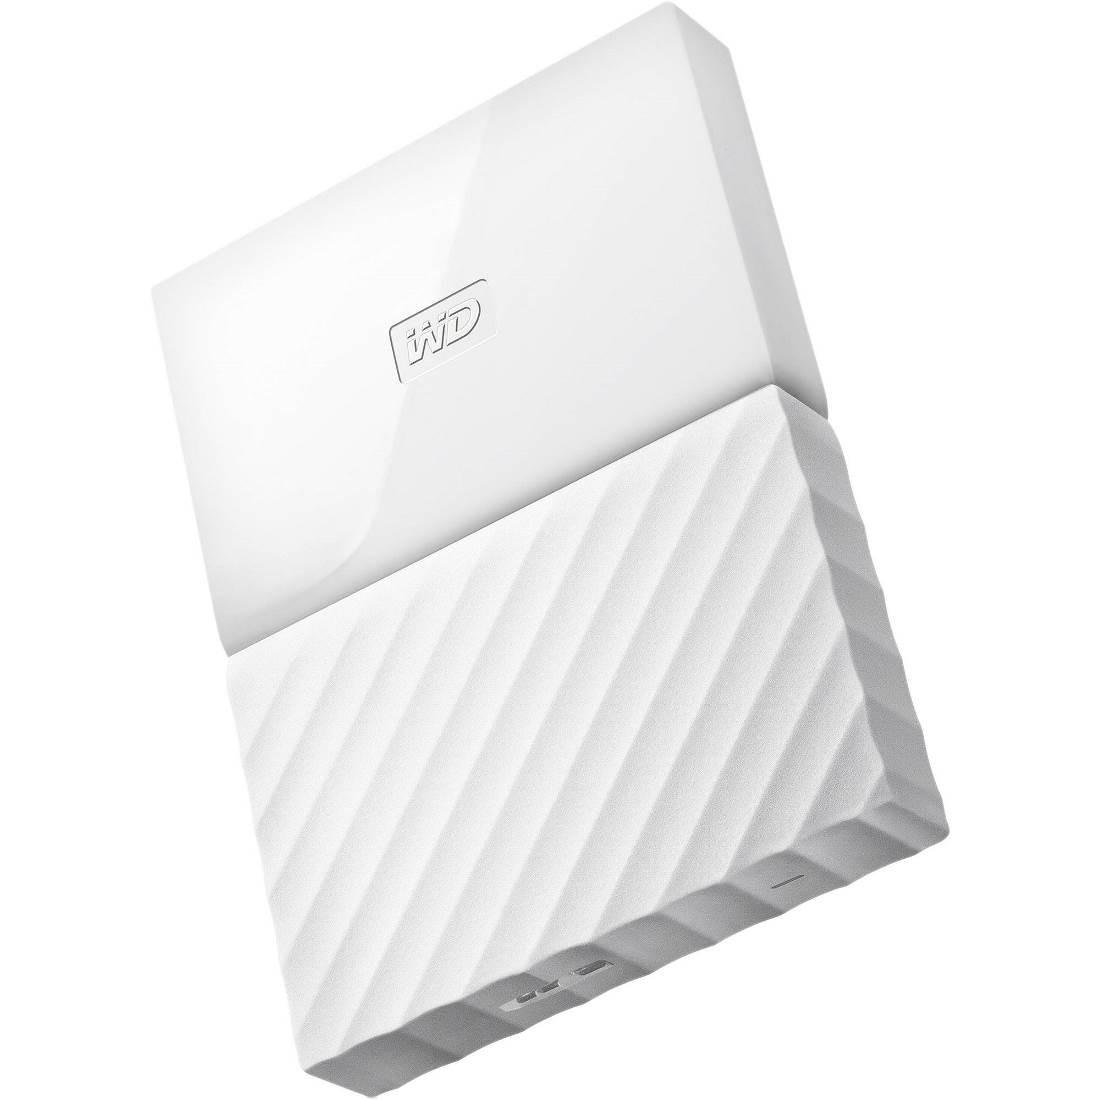 "2TB 2.5"" USB3.0 Western Digital My Passport Ultra External Hard Disk"